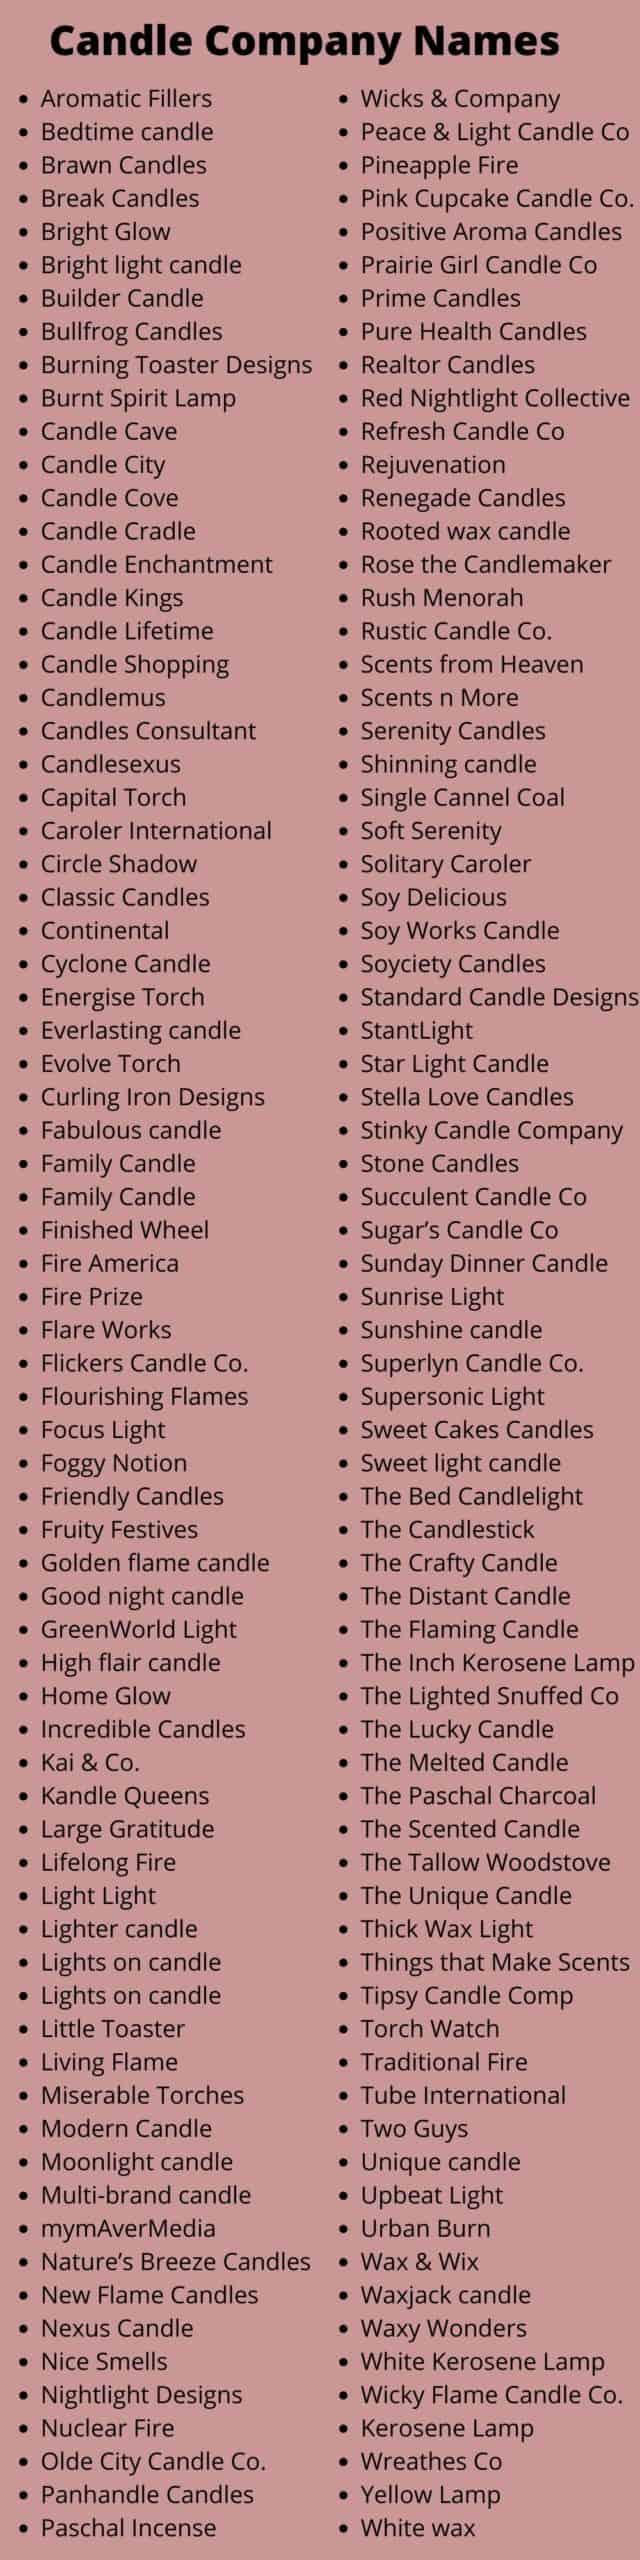 Candle Company Names